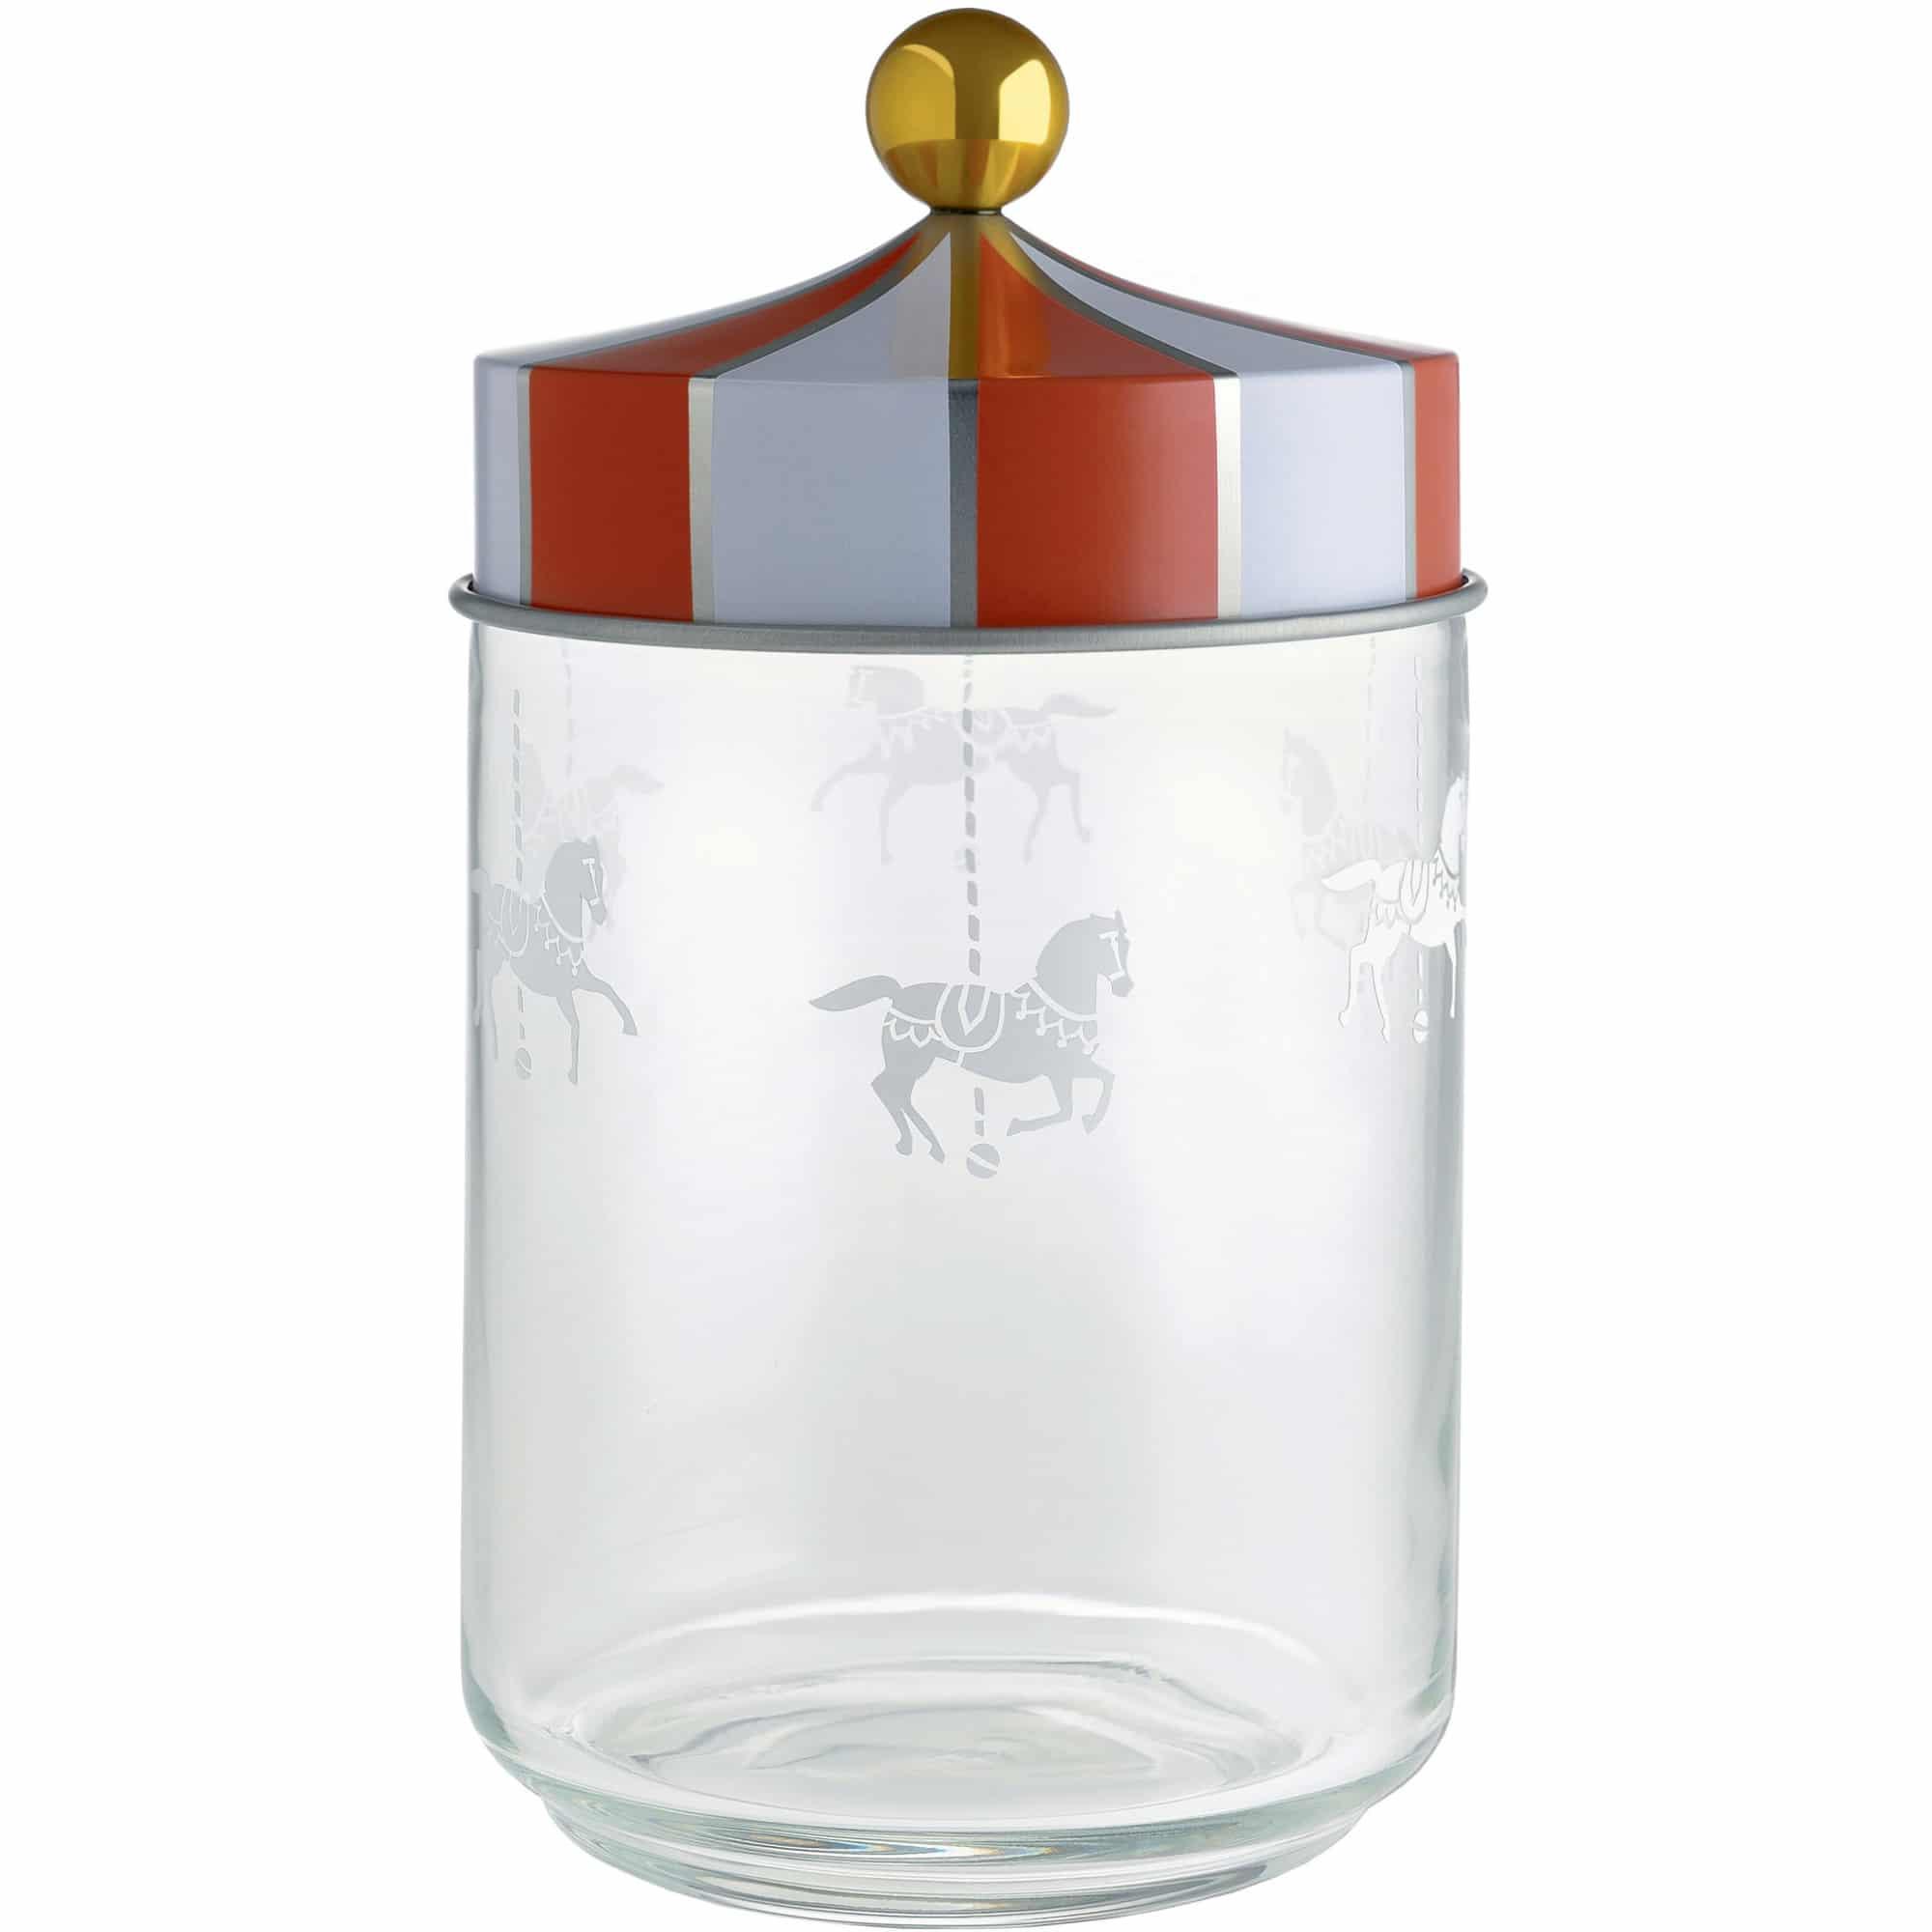 Alessi Circus Glasburk med Hermetiskt lock 100 cl